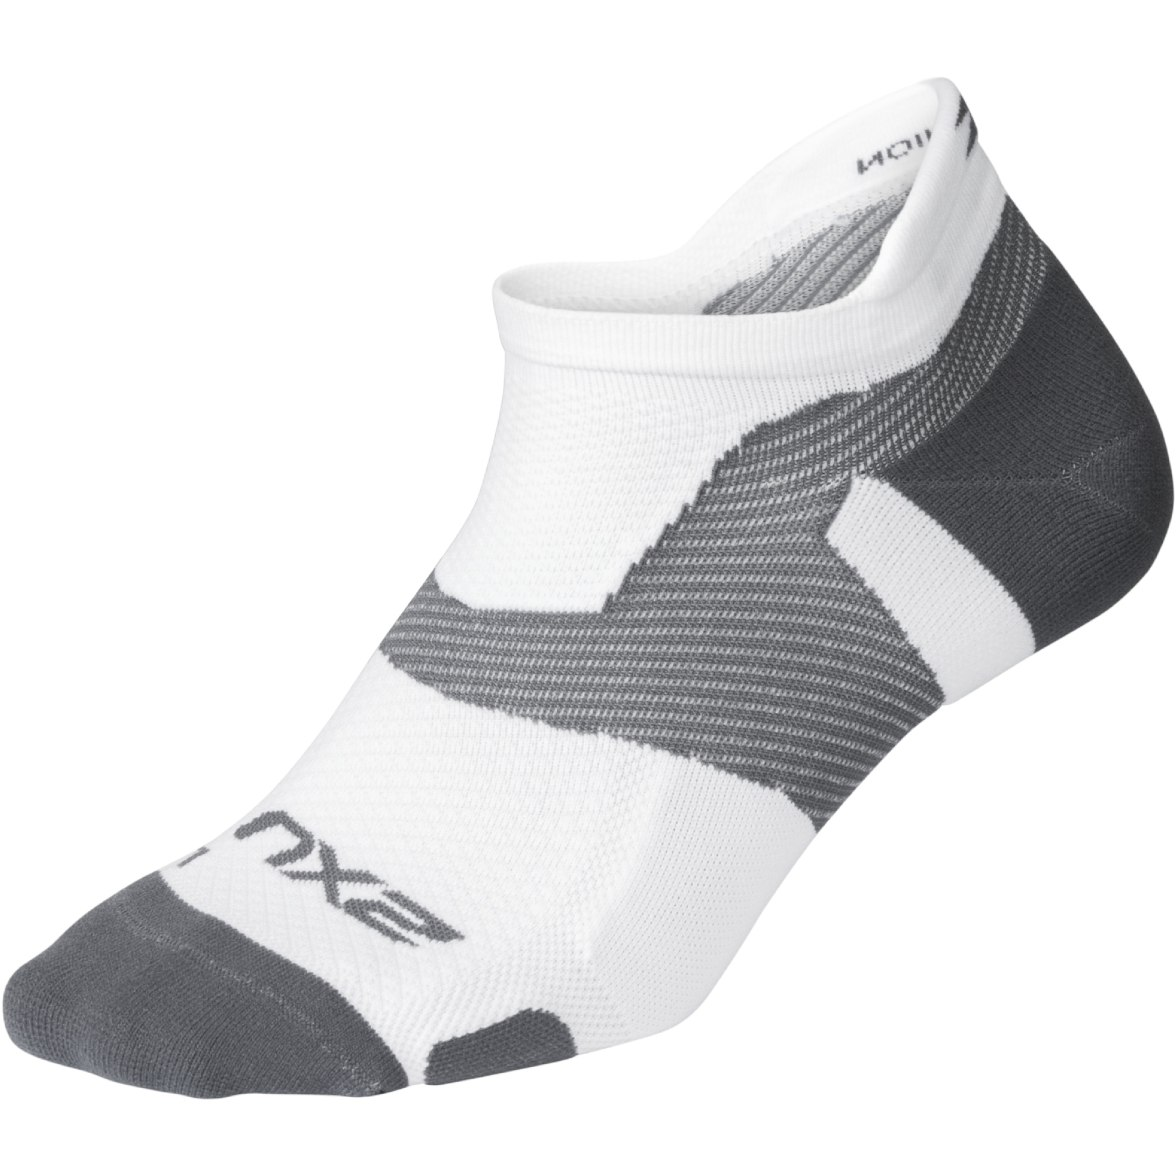 2XU Vectr Light Cushion No Show Socks - white/grey